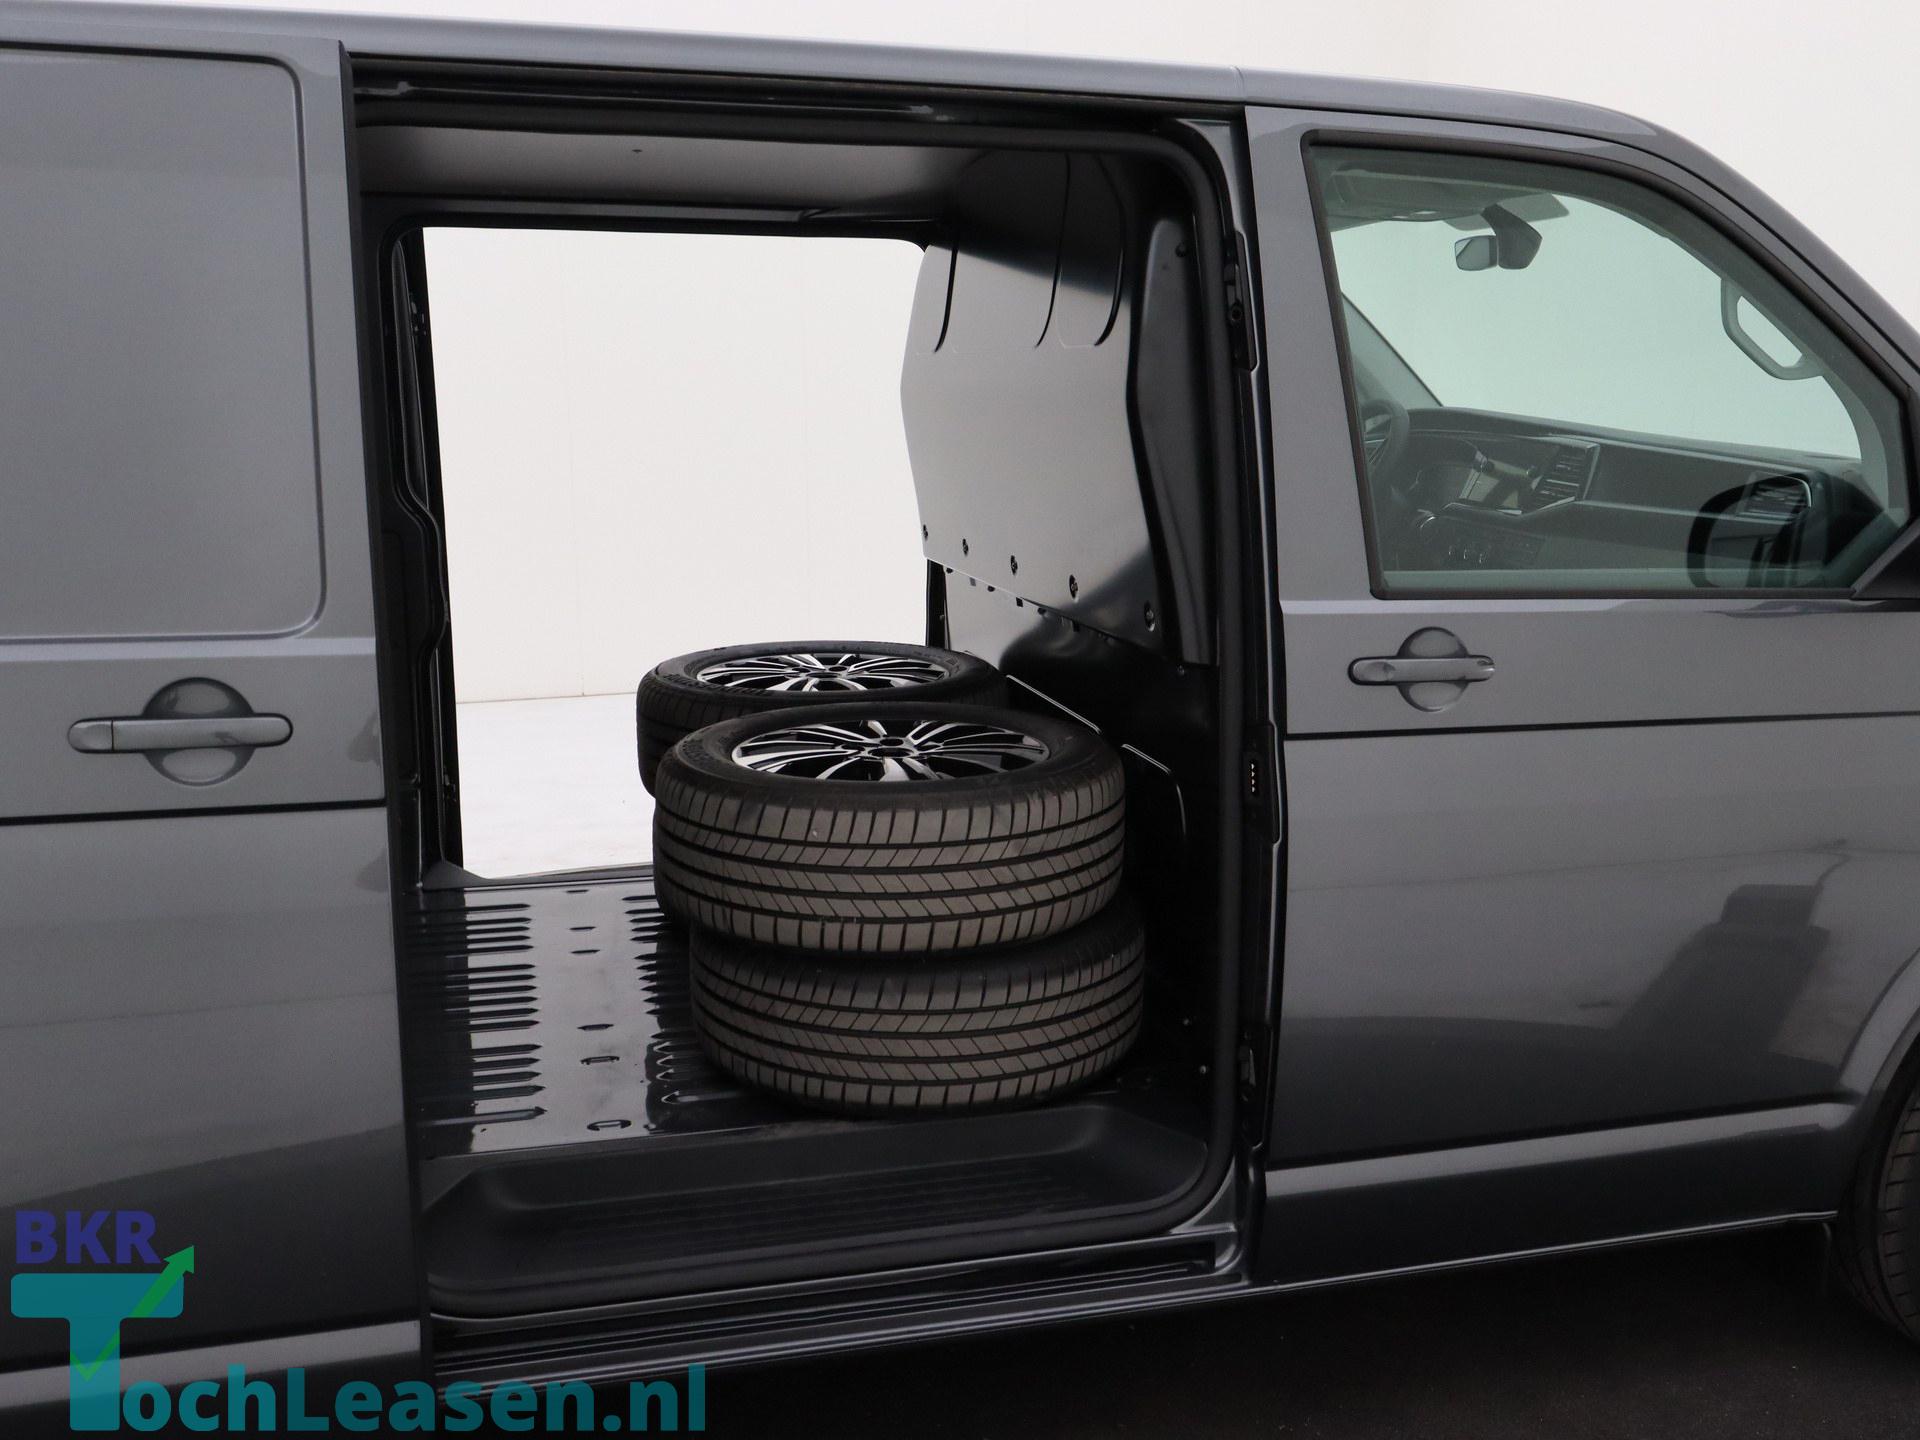 BKR toch leasen - Volkswagen Transporter - Grijs 9